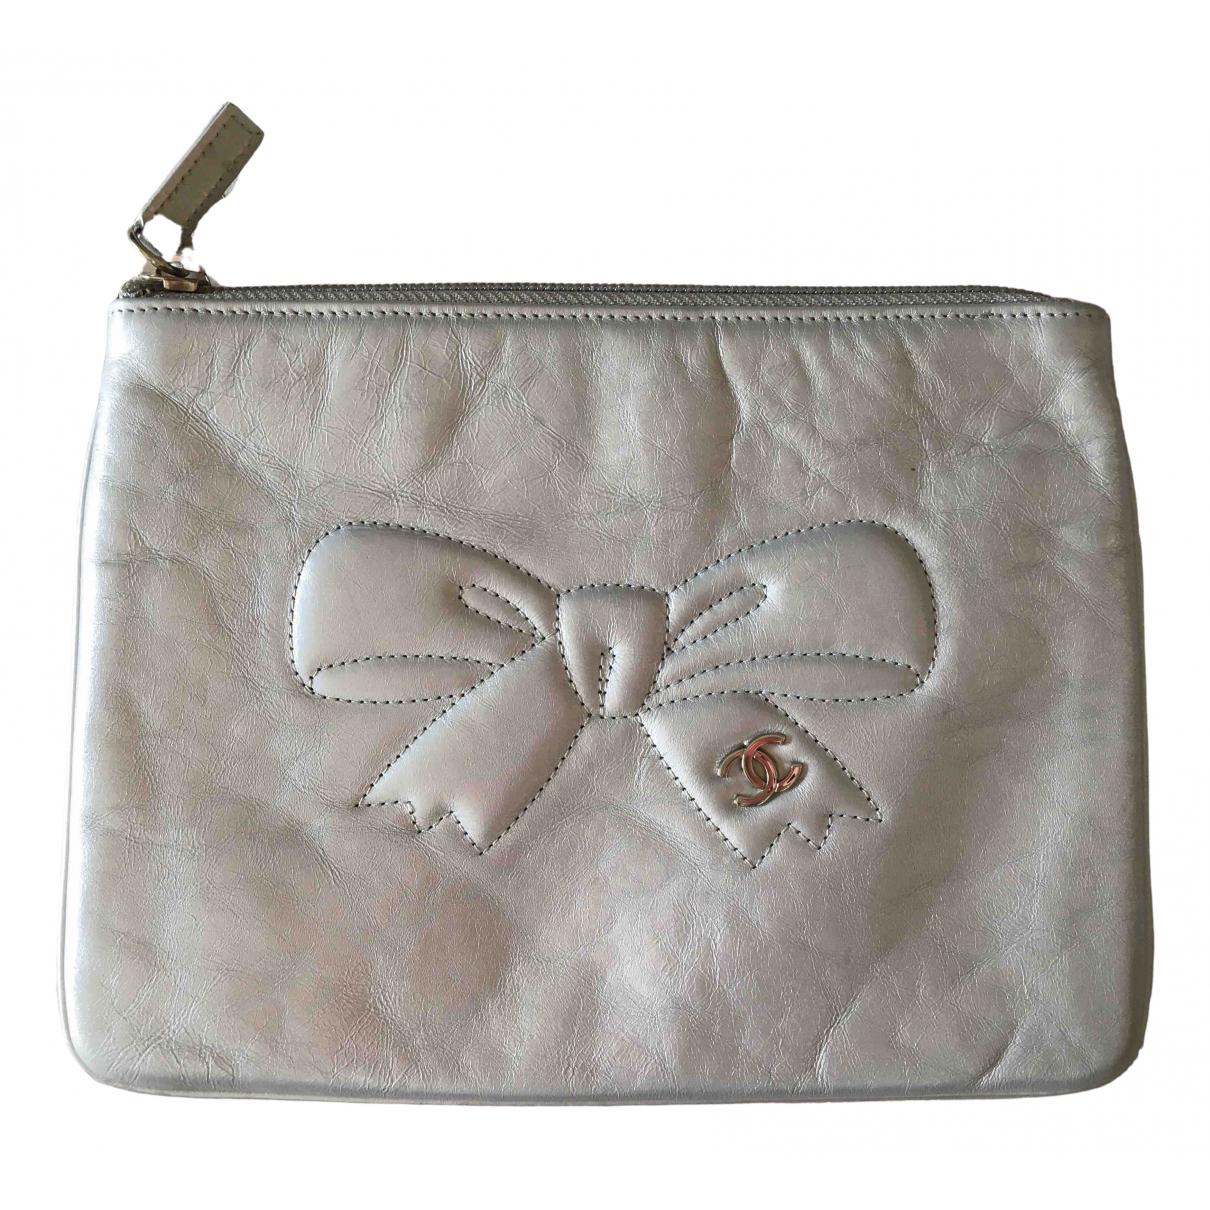 Chanel \N Clutch in  Silber Leder